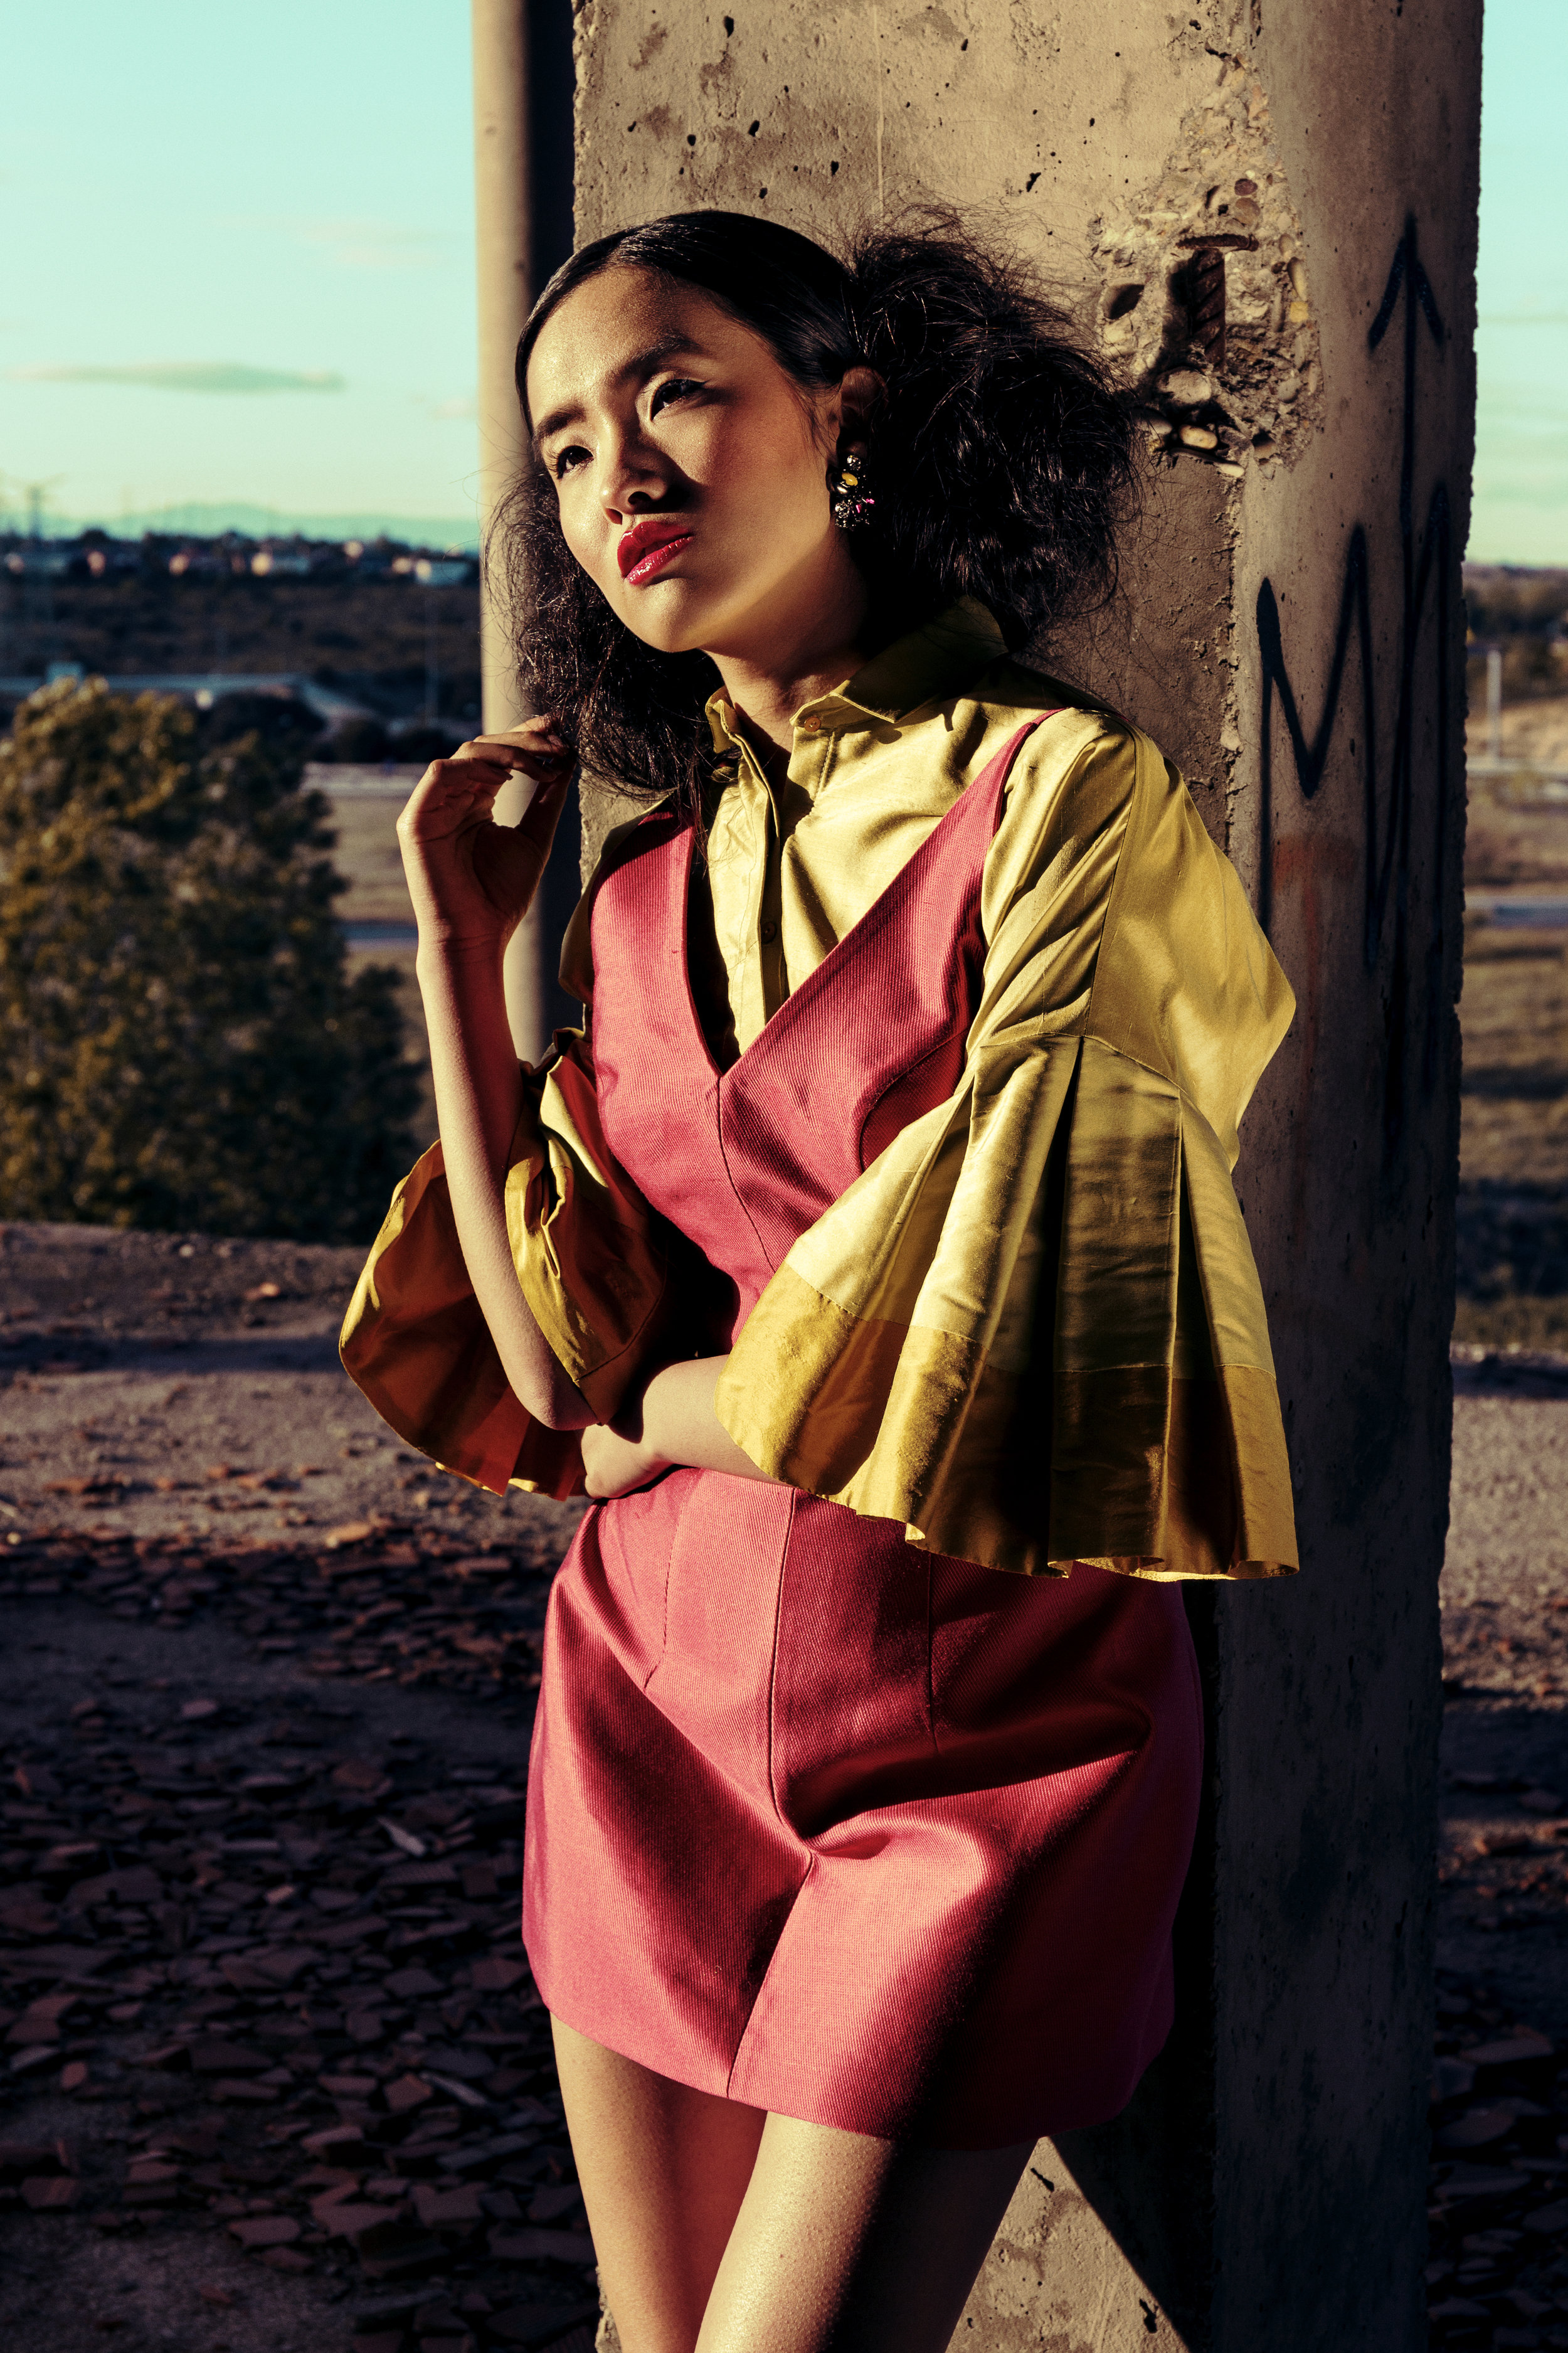 Fuchsia lulu dress made in mikado silk and blouse arant (made in wild silk) zara shoes